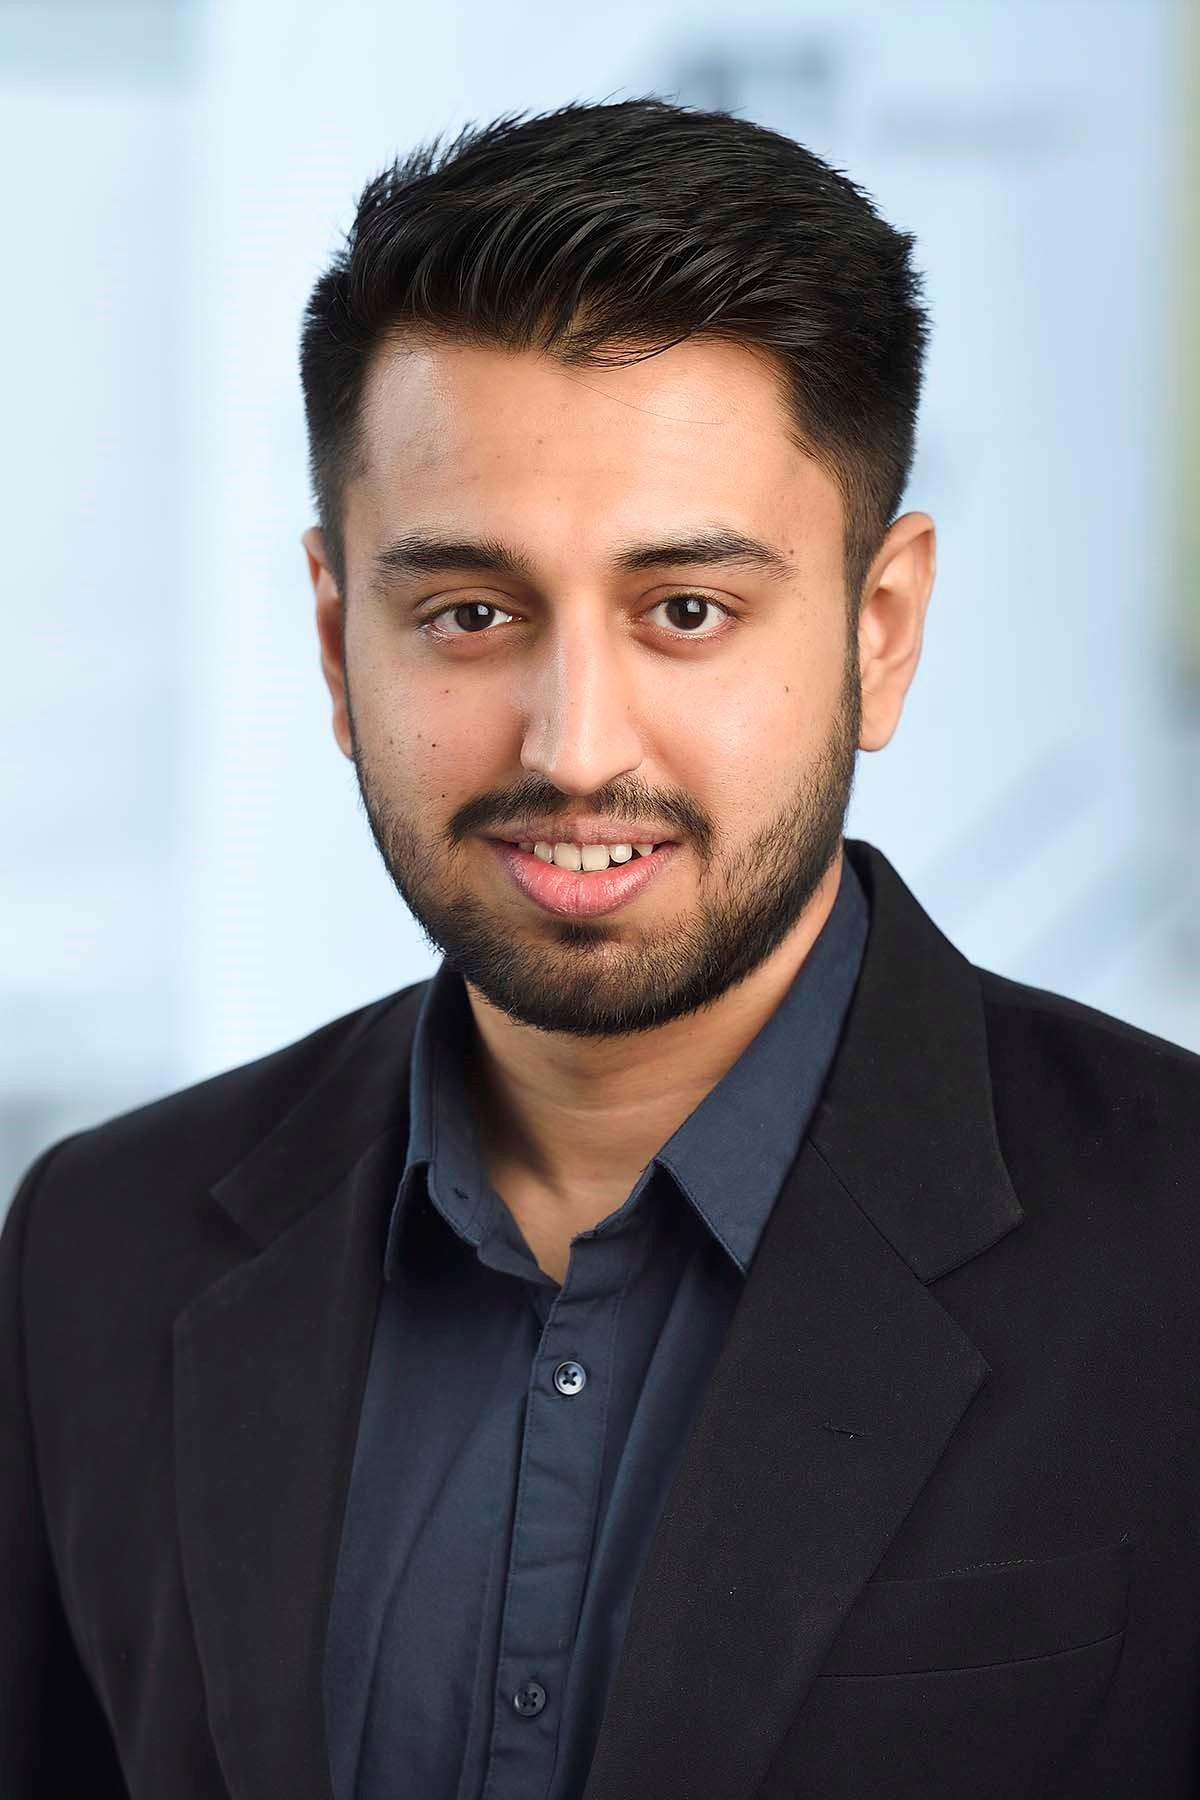 Bharath-Varsh Rao Profilbild